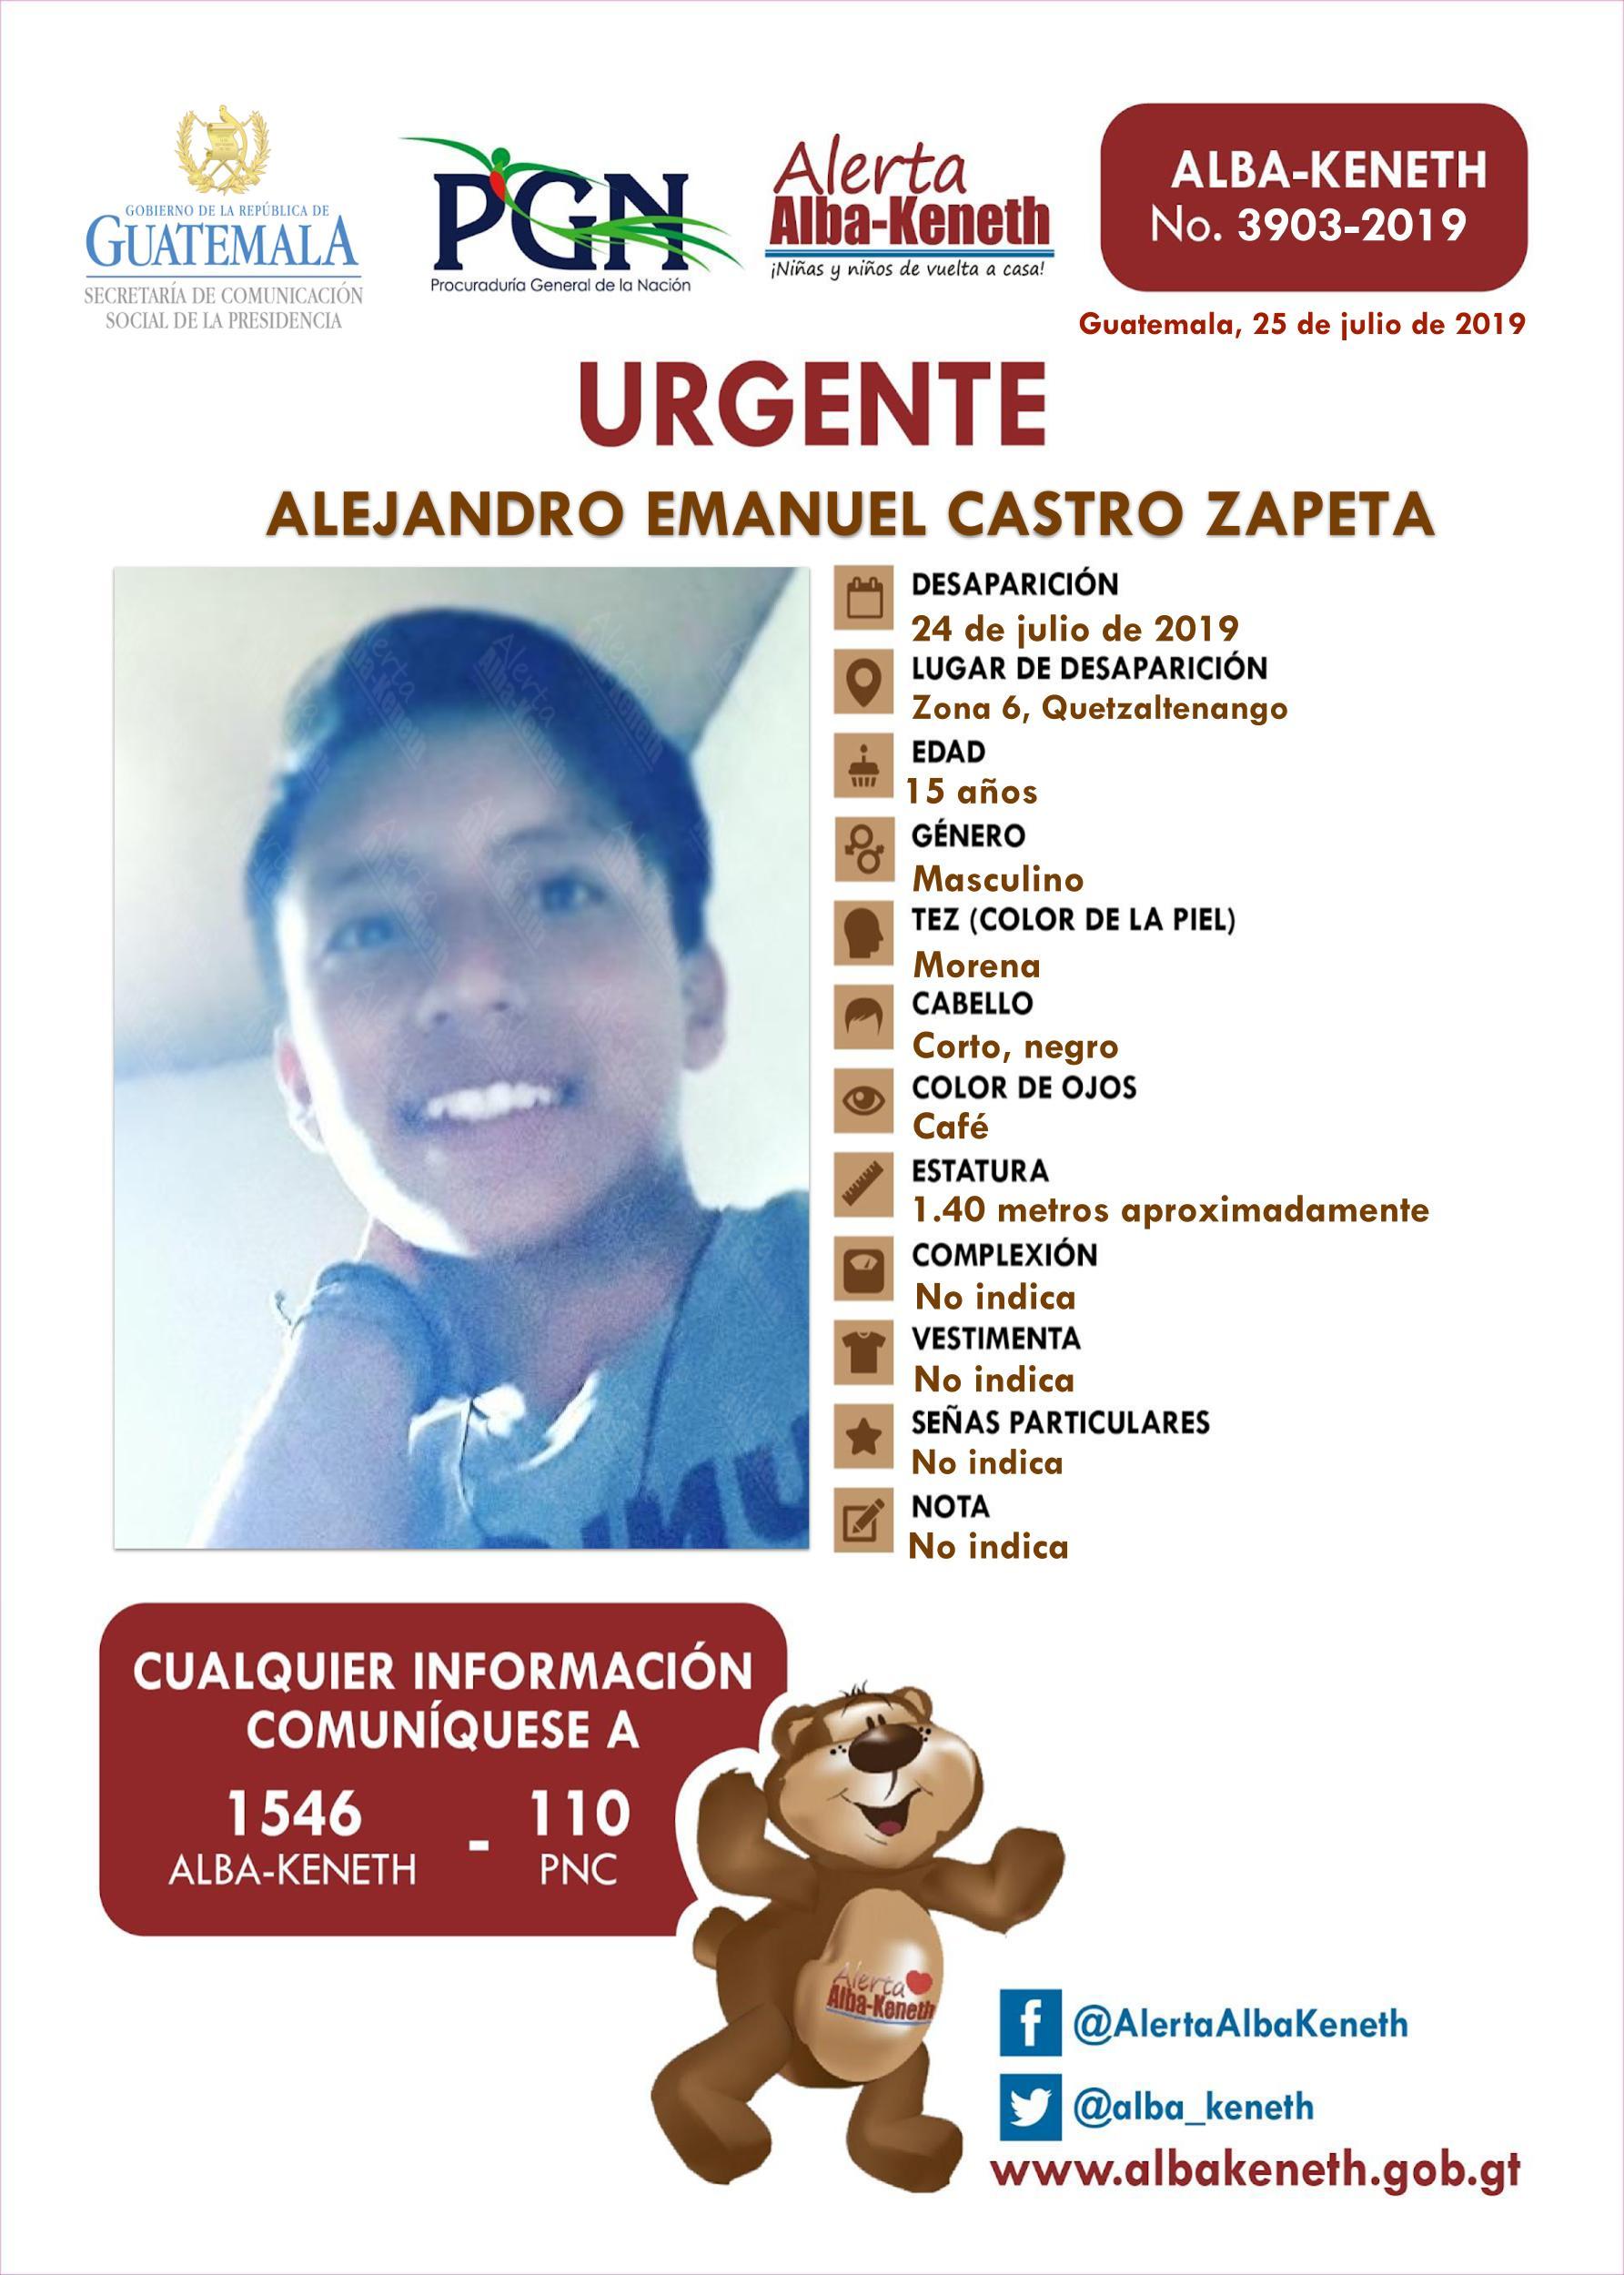 Alejandro Emanuel Castro Zapeta